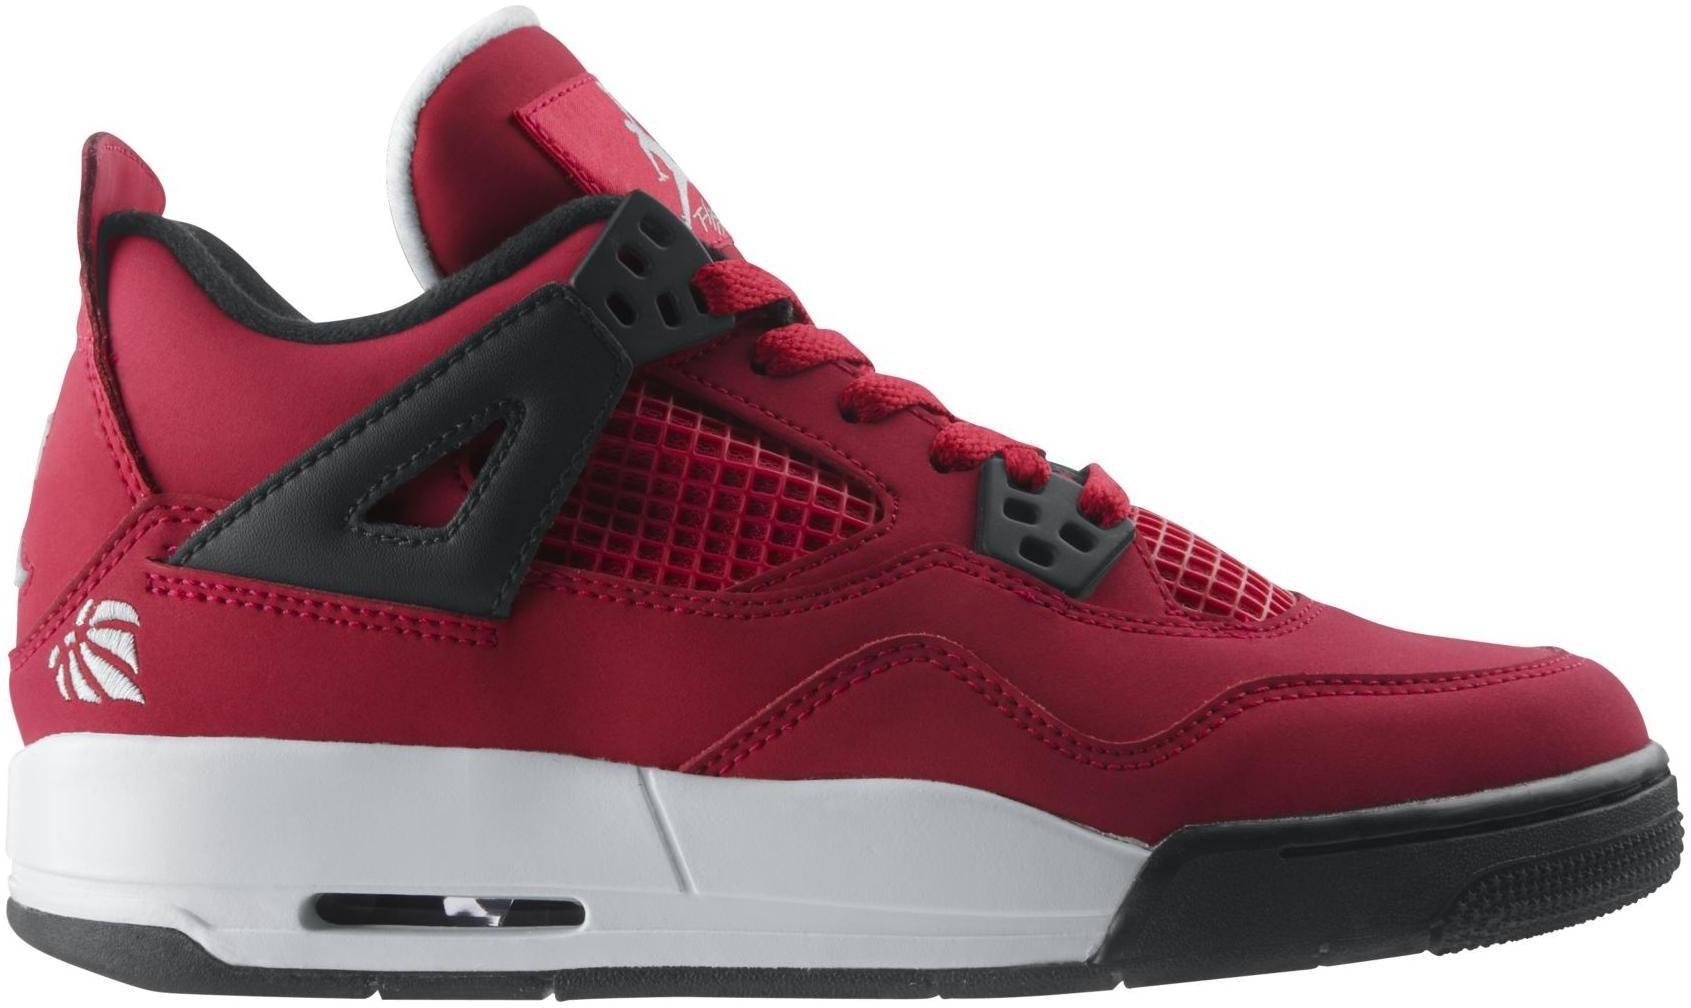 Jordan 4 Retro Voltage Cherry (GS)